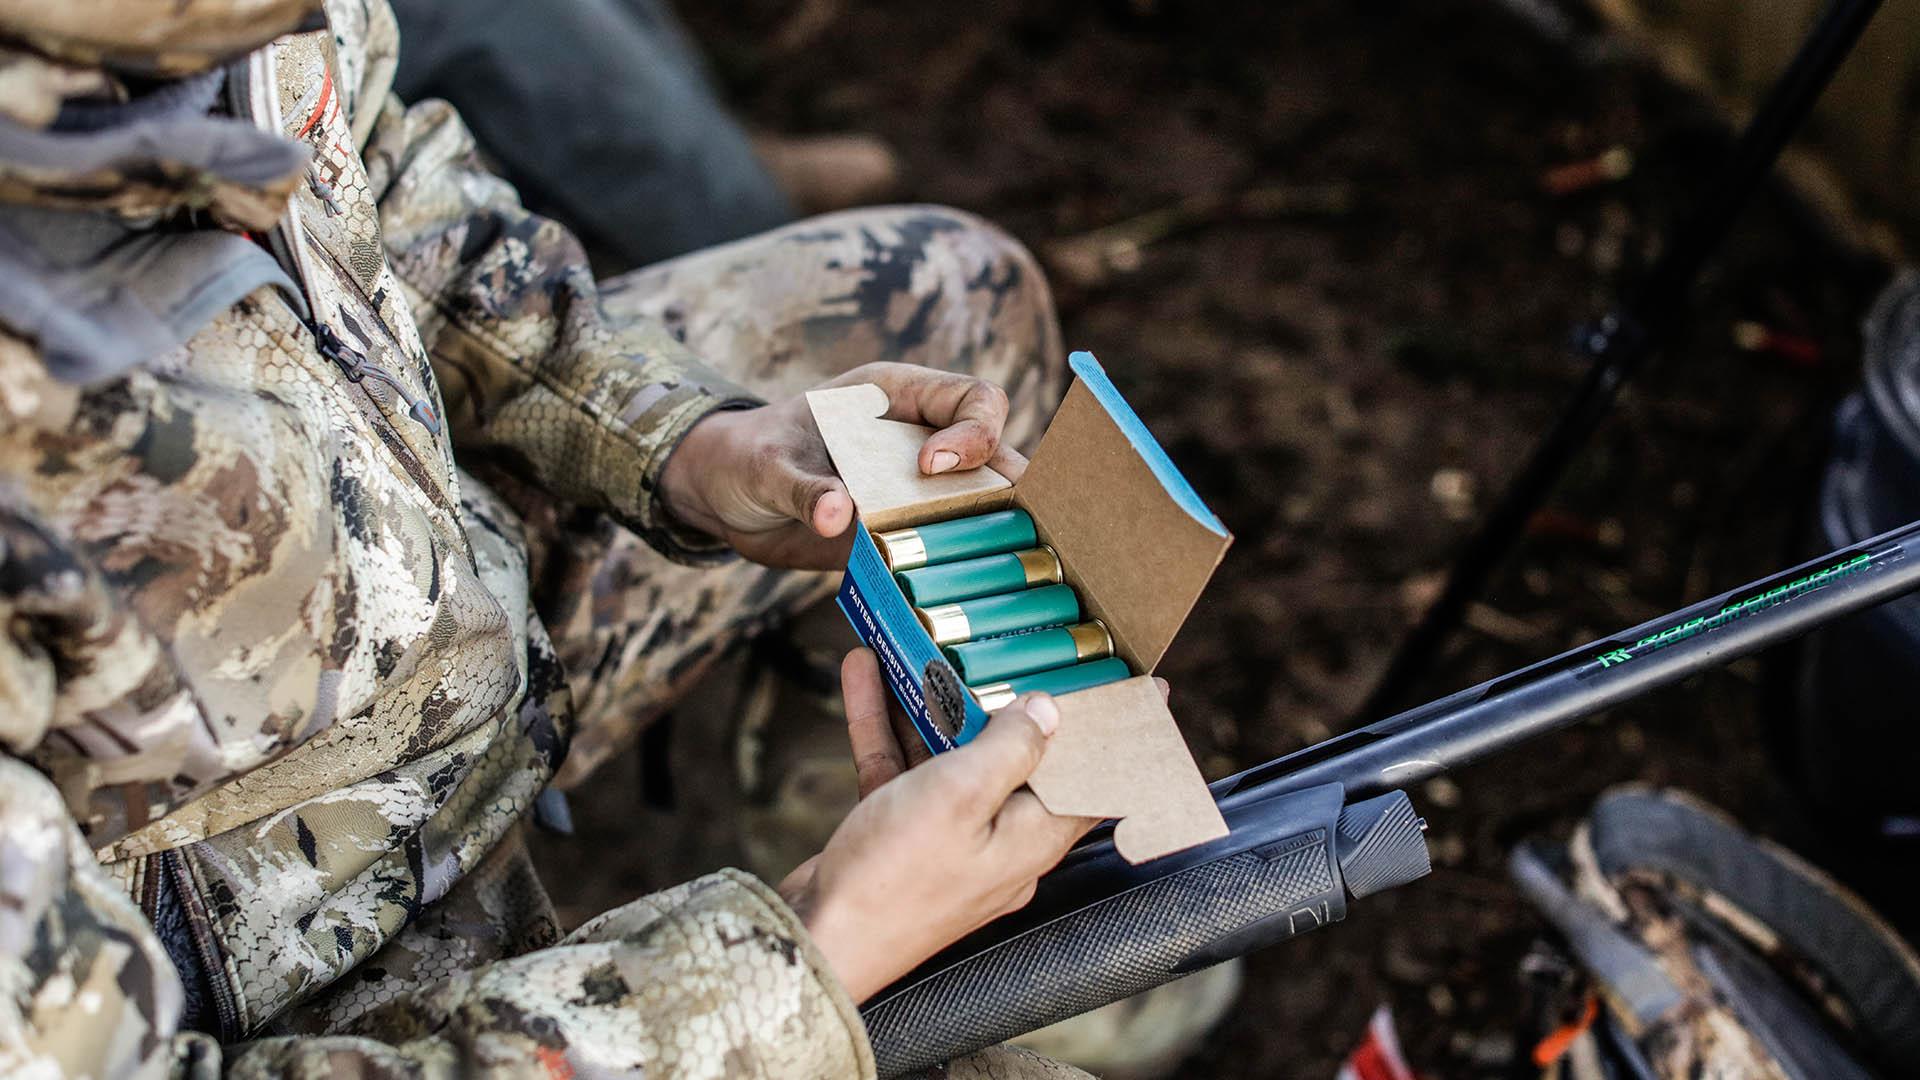 backridge-ammunition-photos-0001-noved-365.jpg